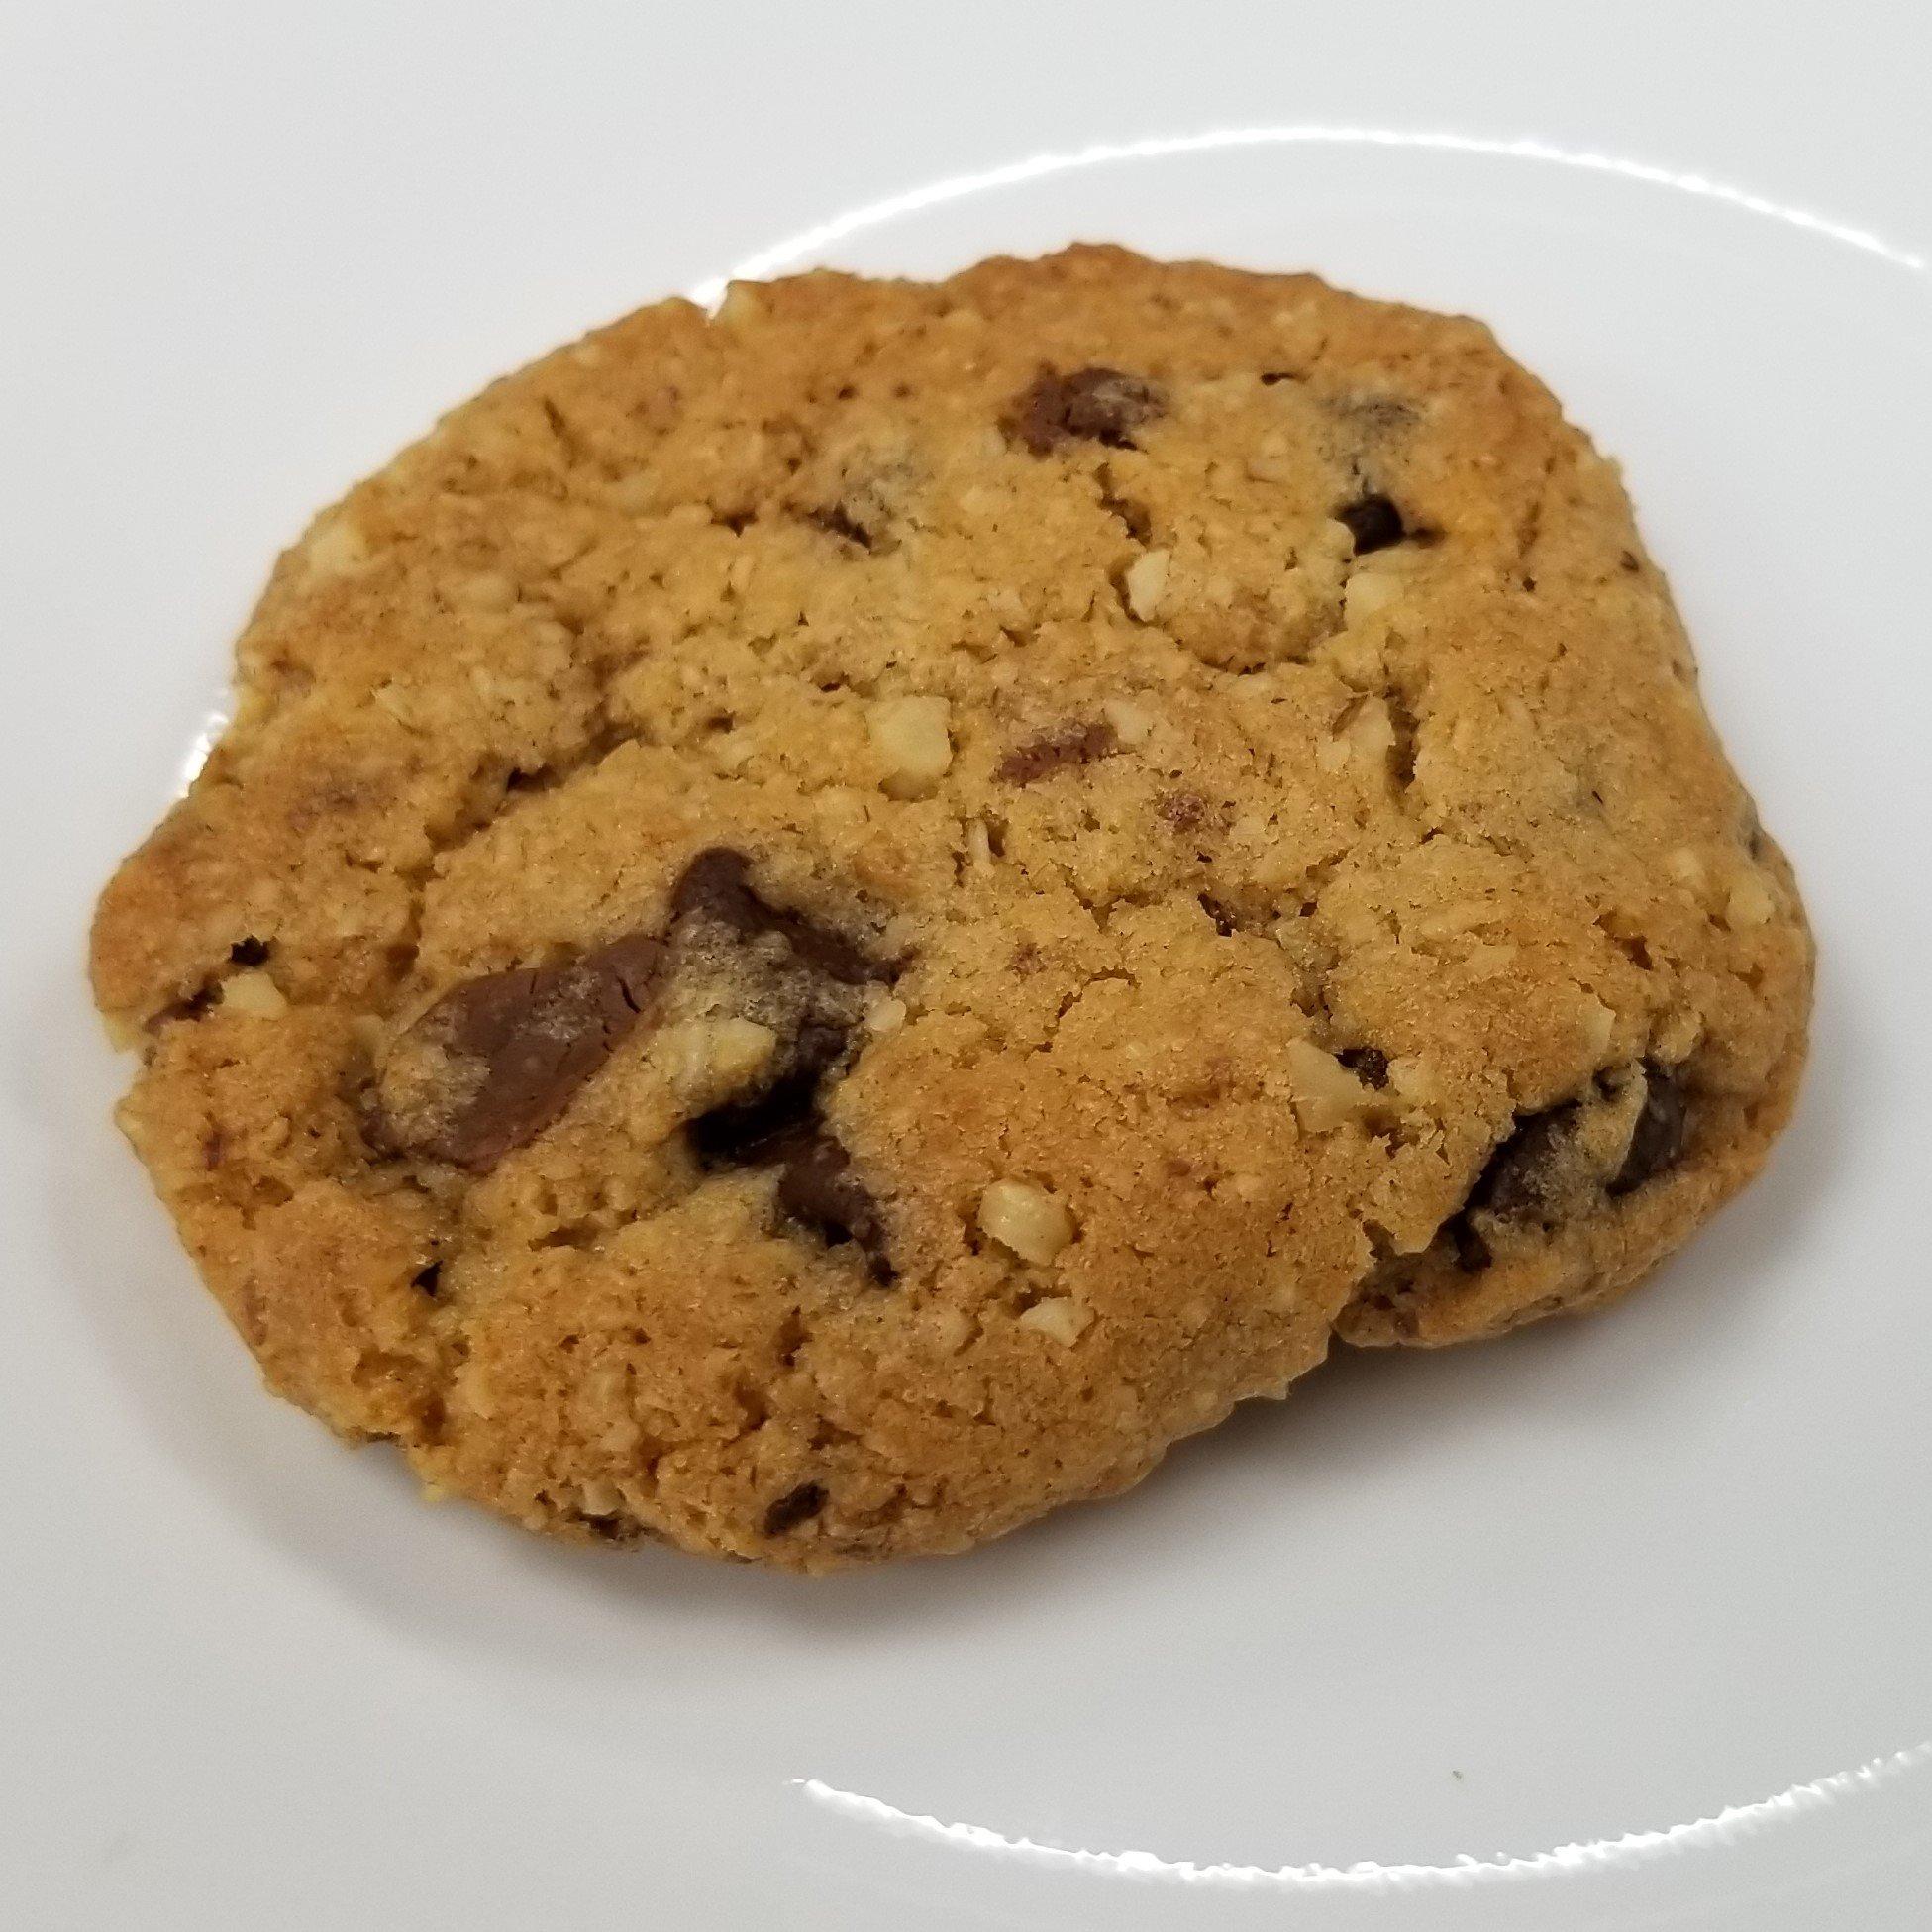 The-Rocks-Favorite-Chocolate-Chip-Cookies-2